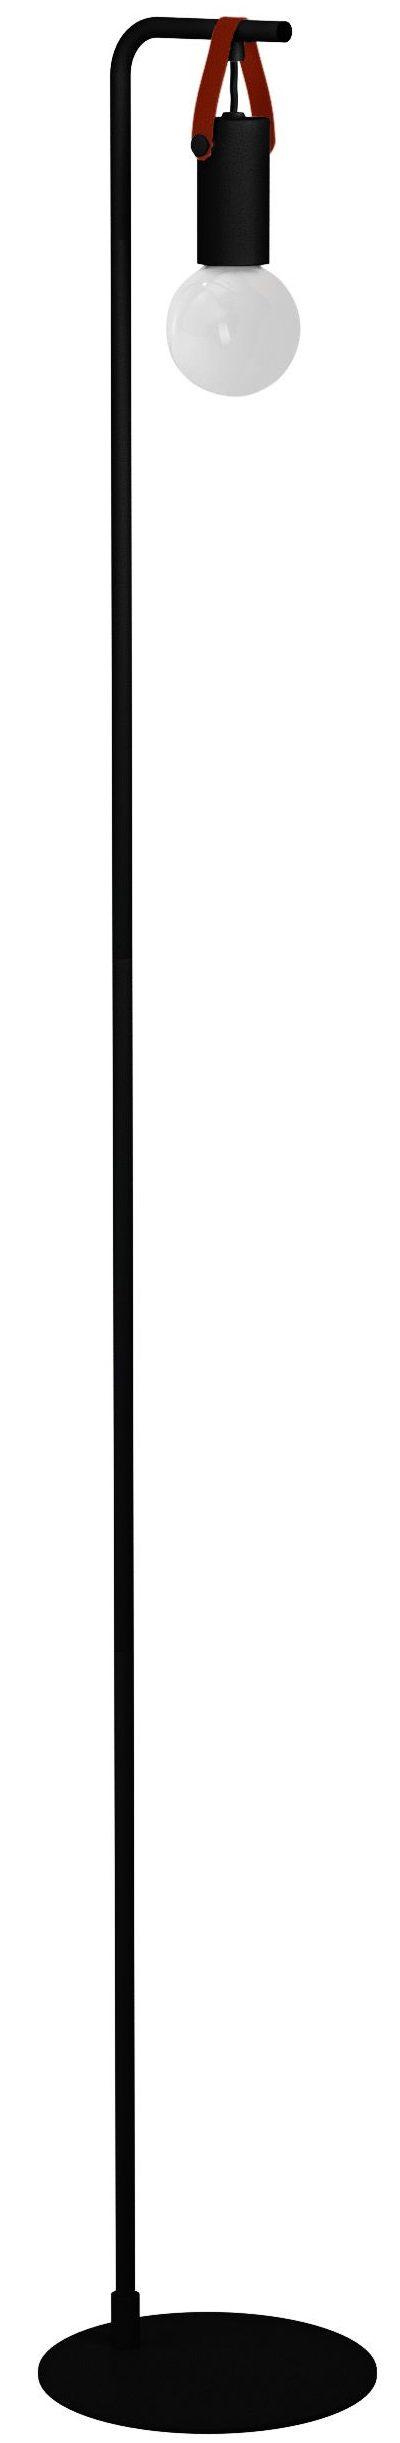 Apricale vloerlamp - zwart - bruin Eglo Vloerlamp 33809-EGLO